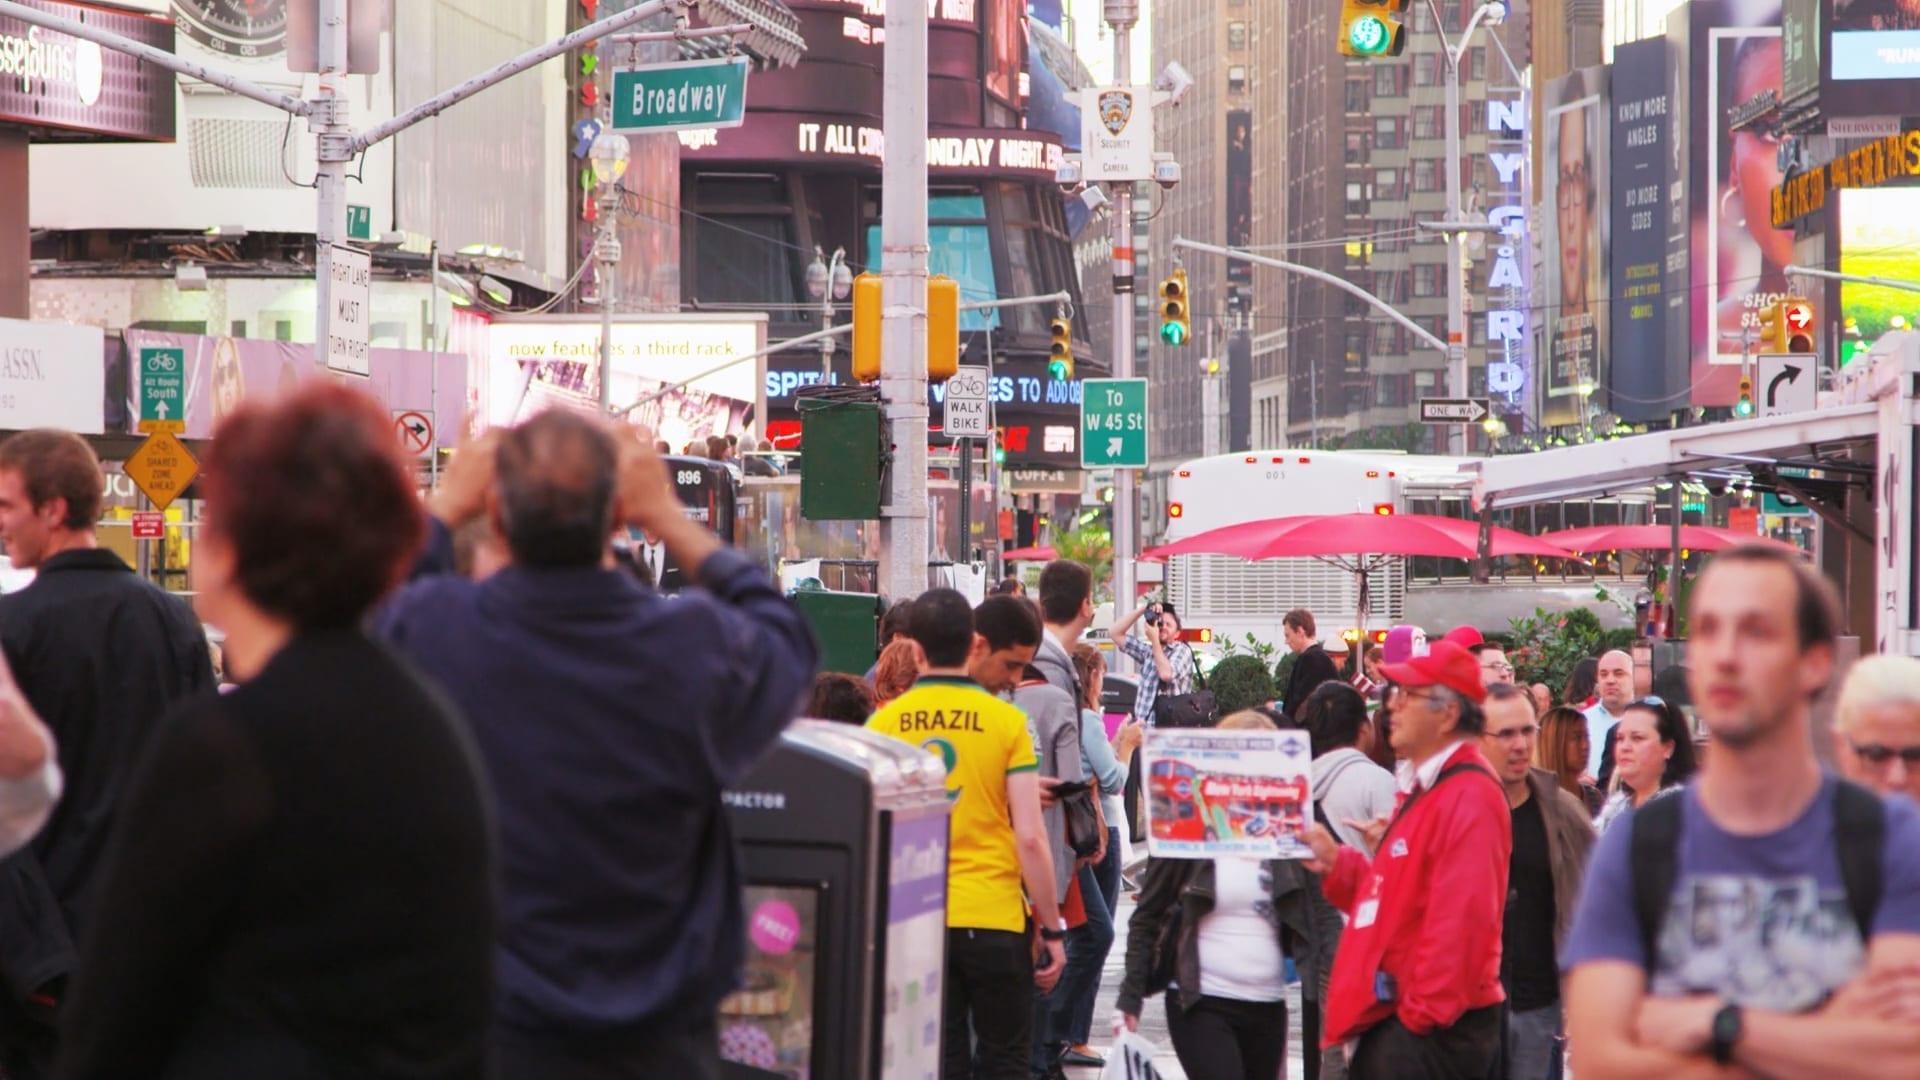 Crise brasileira chega a Broadway